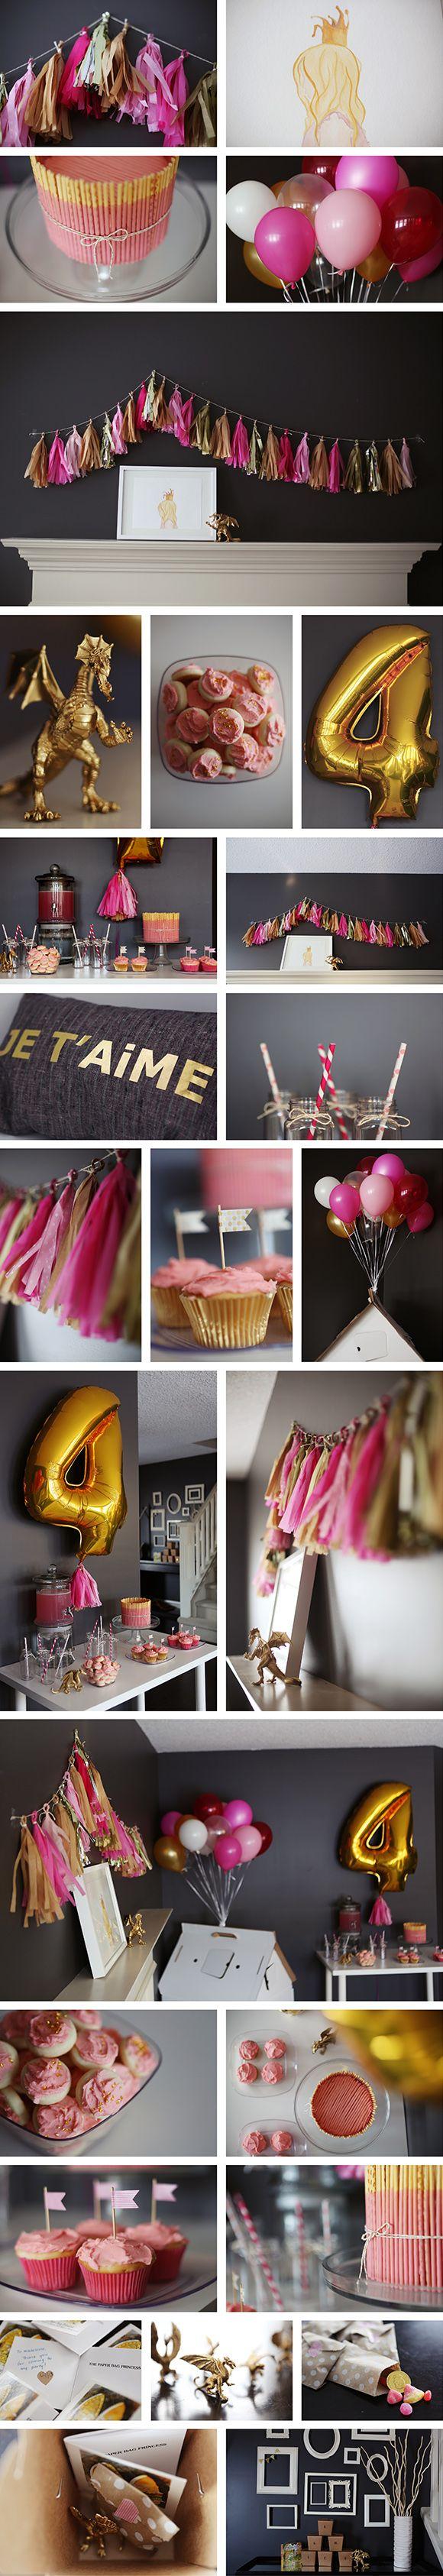 pinksugarland paper bag princess party